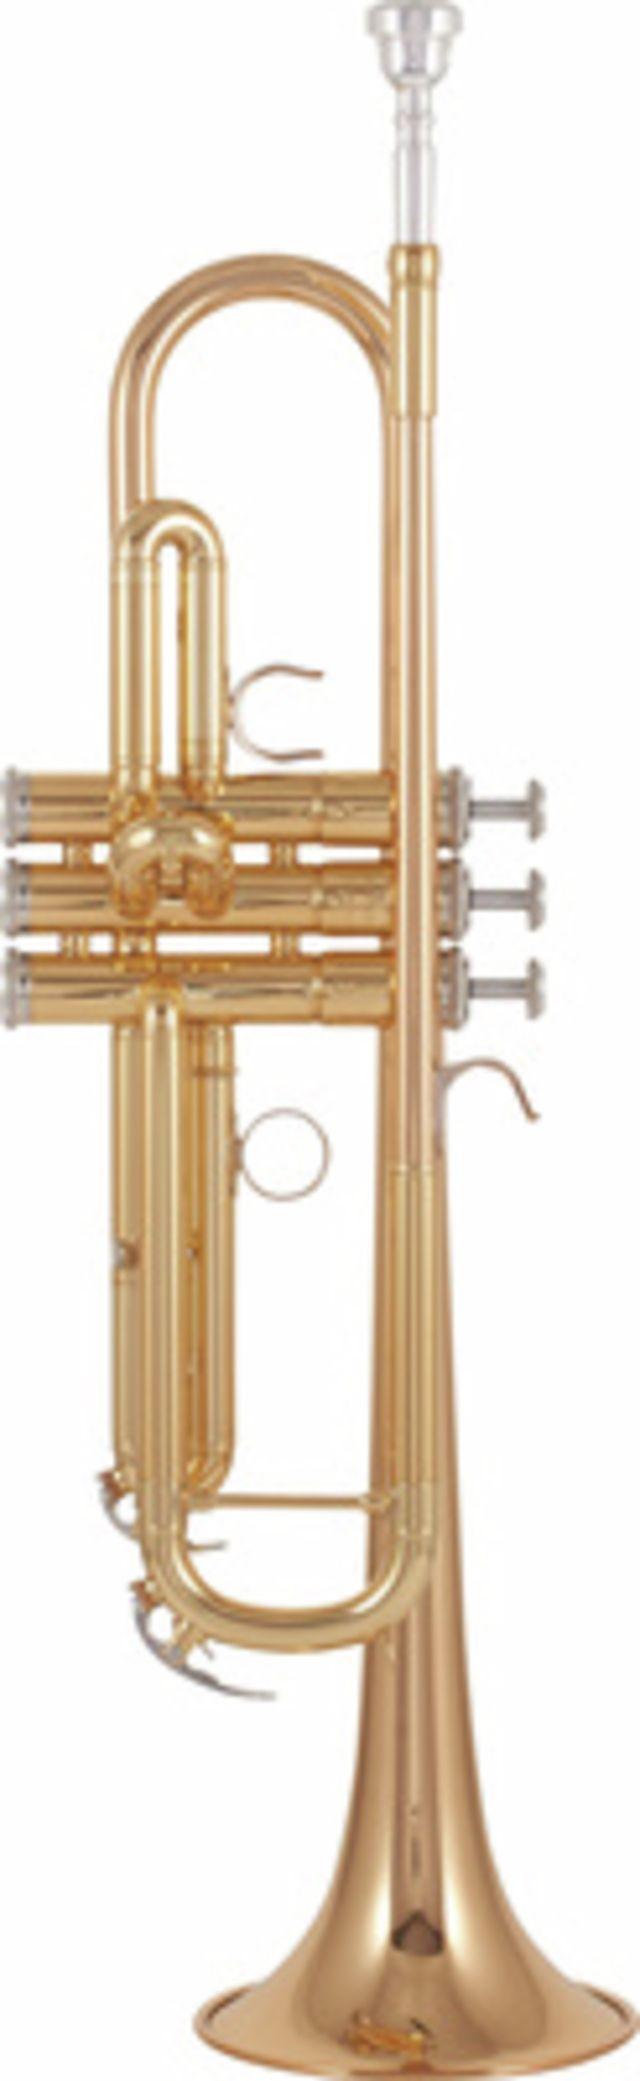 Yamaha YTR-4335 GII Trumpet